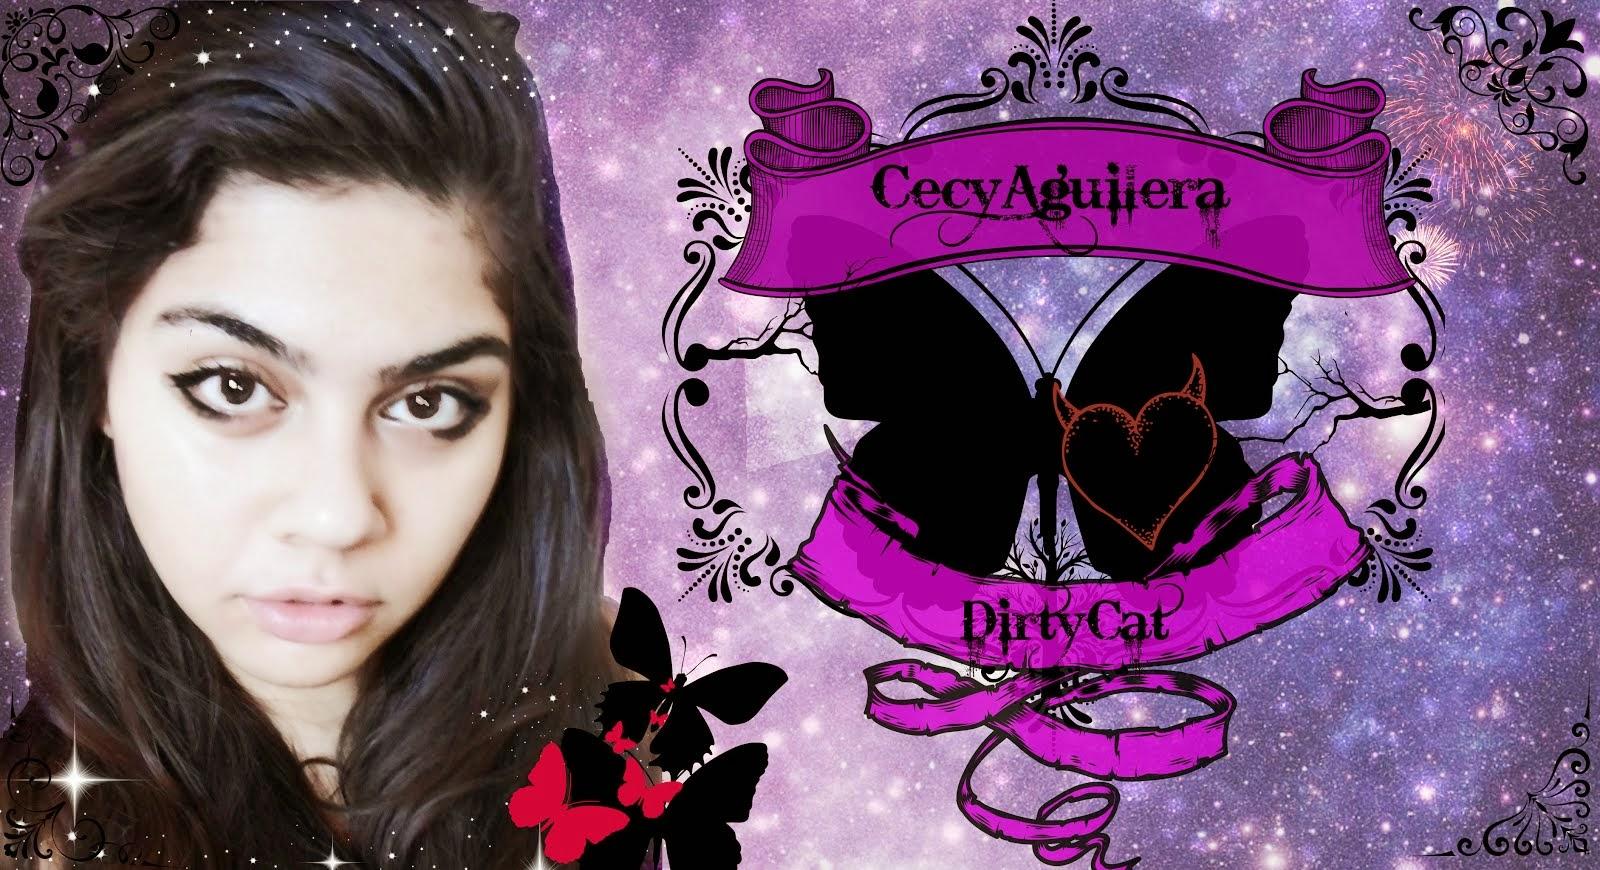 Cecy Aguilera Blog - Gata Borralheira - Cecilia Aguilera Site Oficial